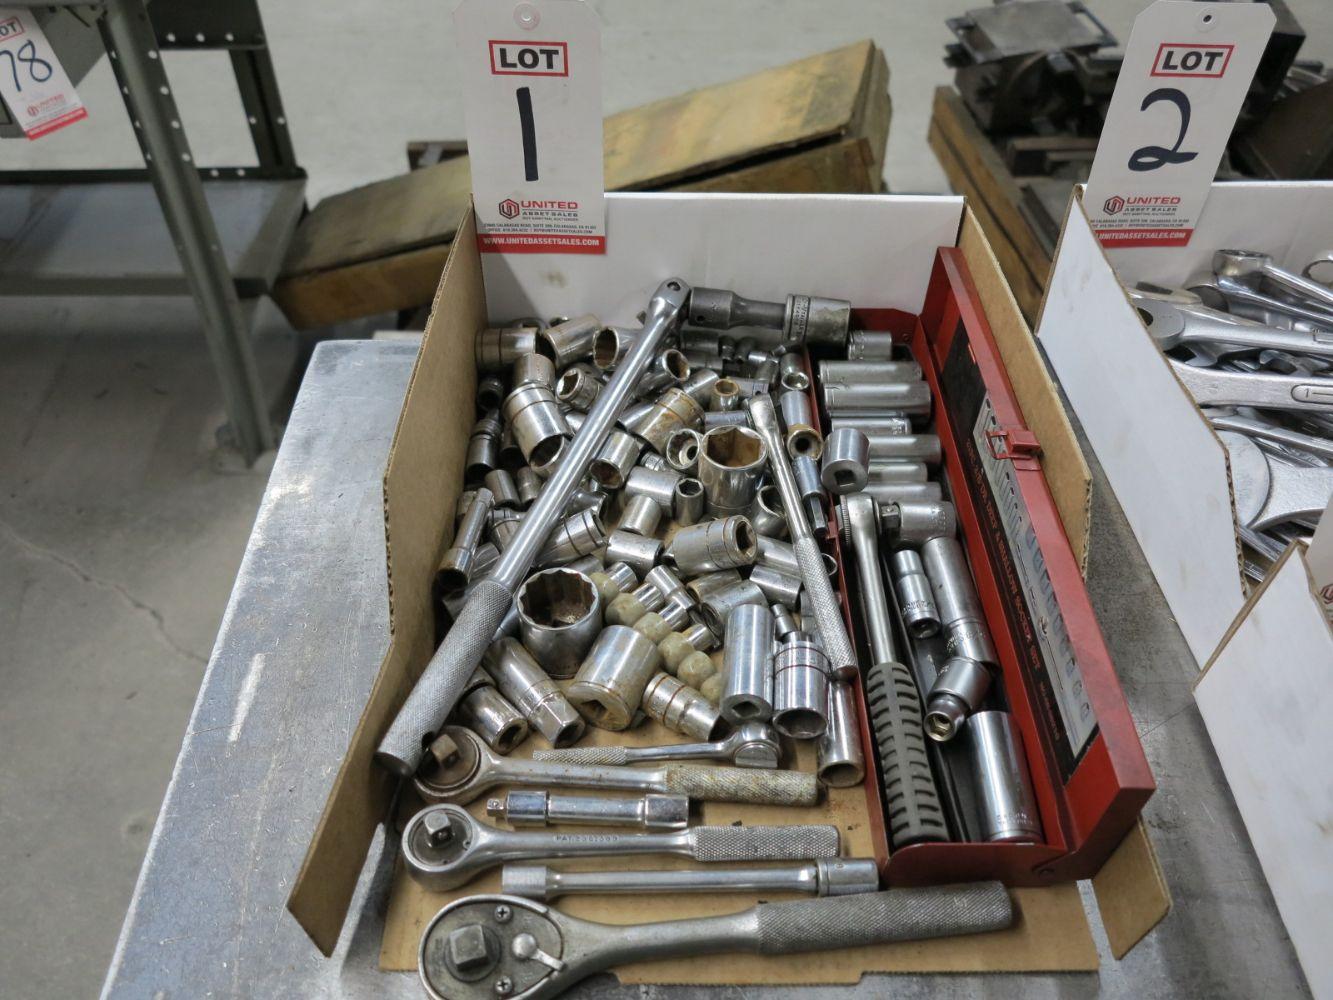 2003 FADAL TRM & (2) 2003 FADAL 3016 CNC VERTICAL MACHINING CENTERS, MAZAK QUICKTURN CNC LATHES, (2) ENSHU YUASA ACCU-MILLS, WEBSTER BENNETT 48